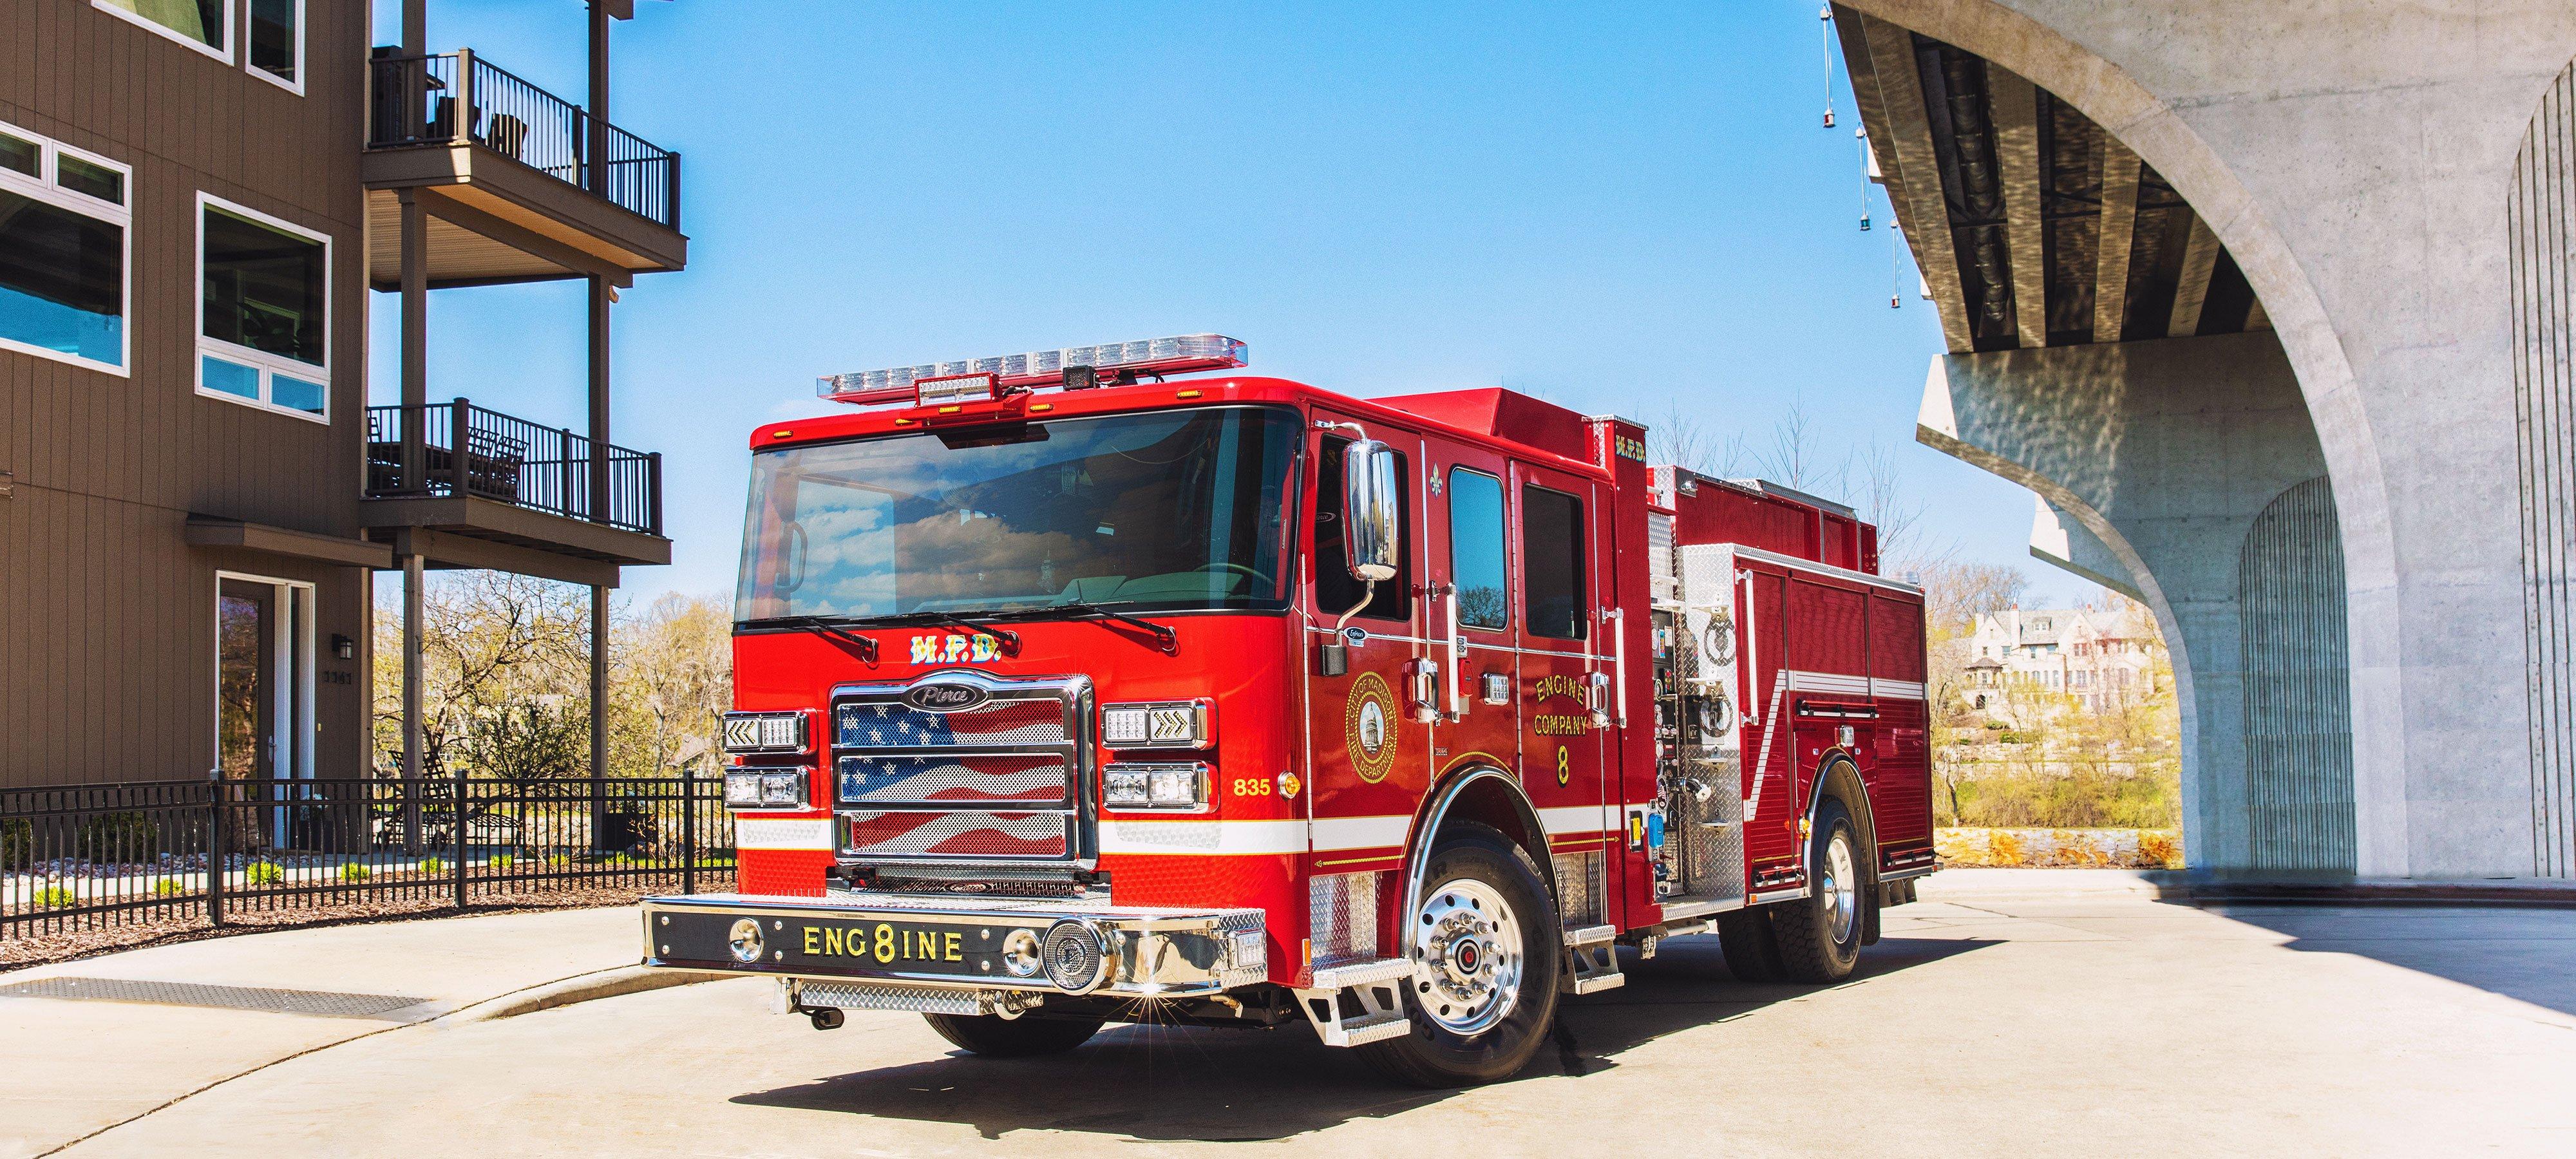 Volterra Platform of Electric Fire Trucks